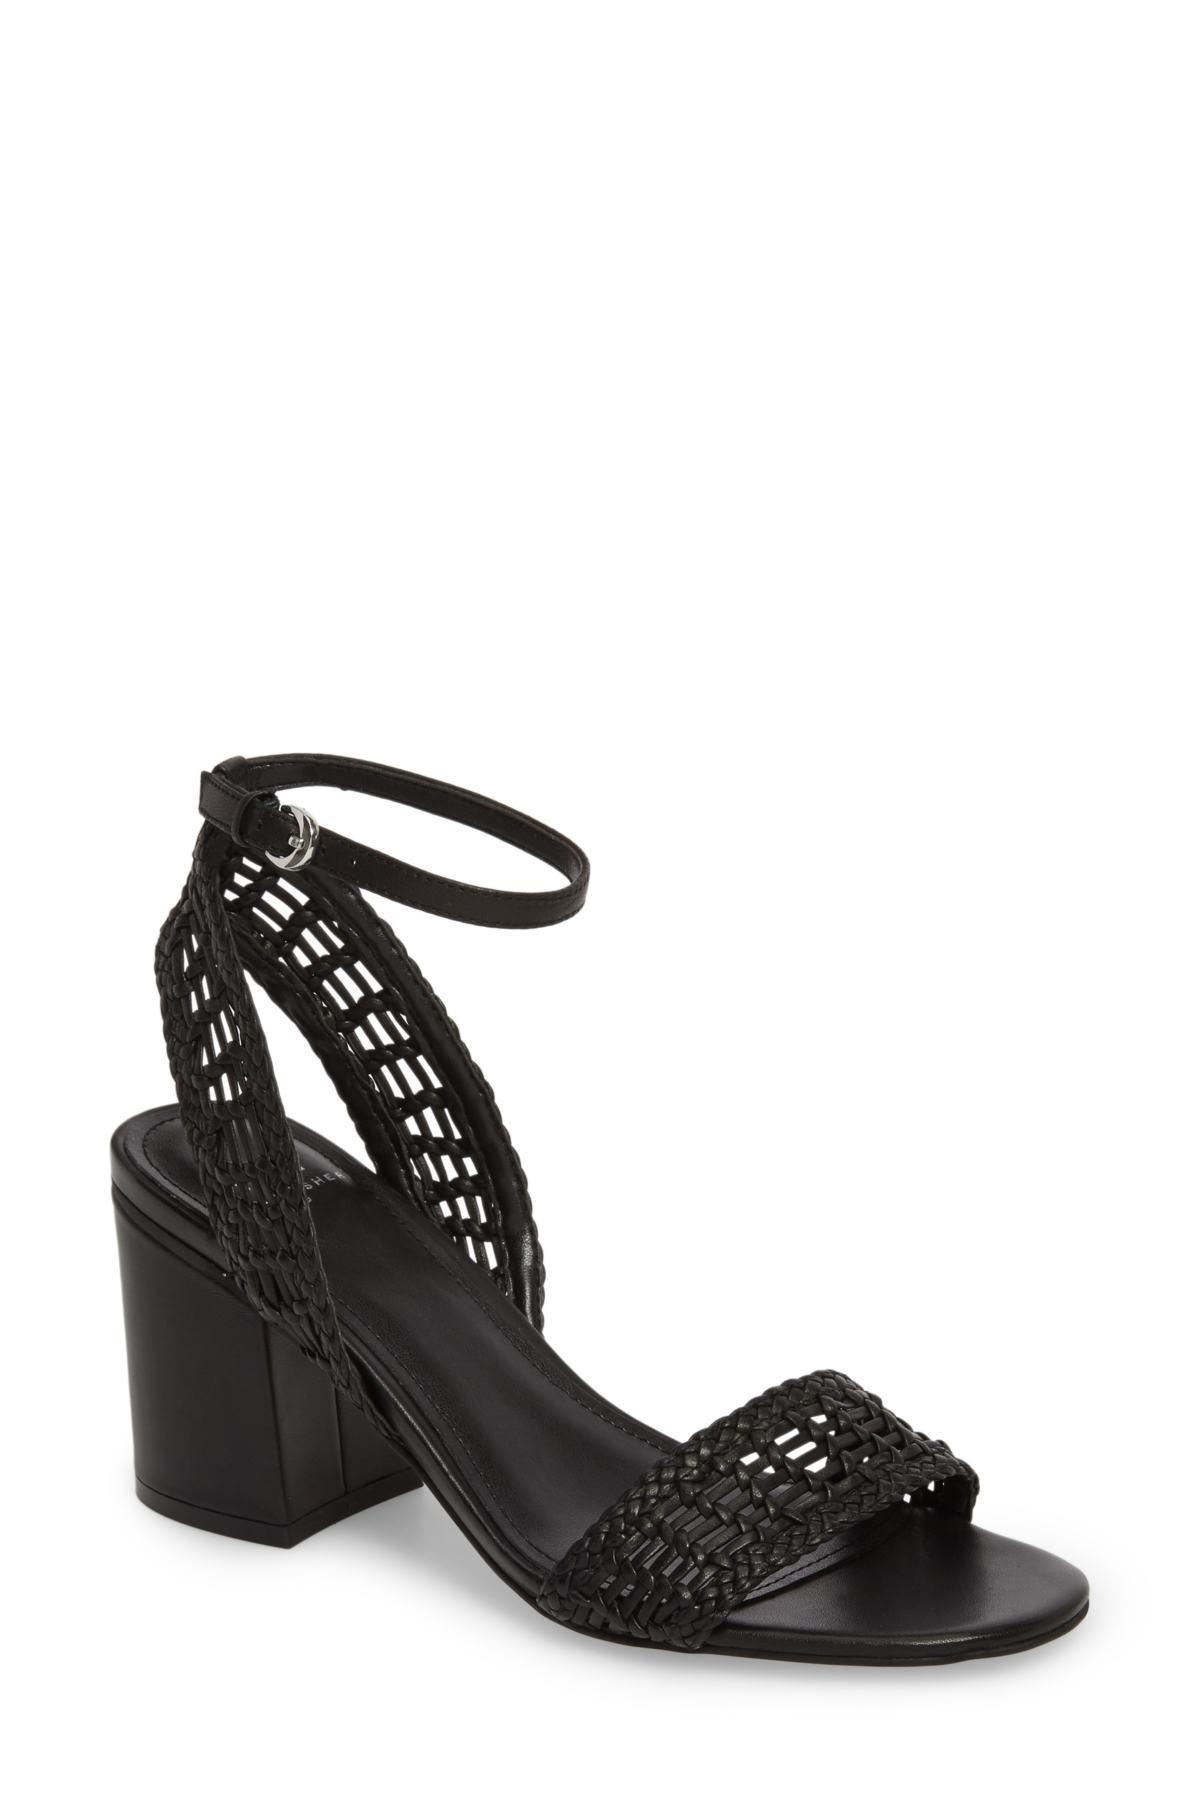 399b165f4f4 Marc Fisher Amere Ankle Strap Sandal (women) in Black - Lyst